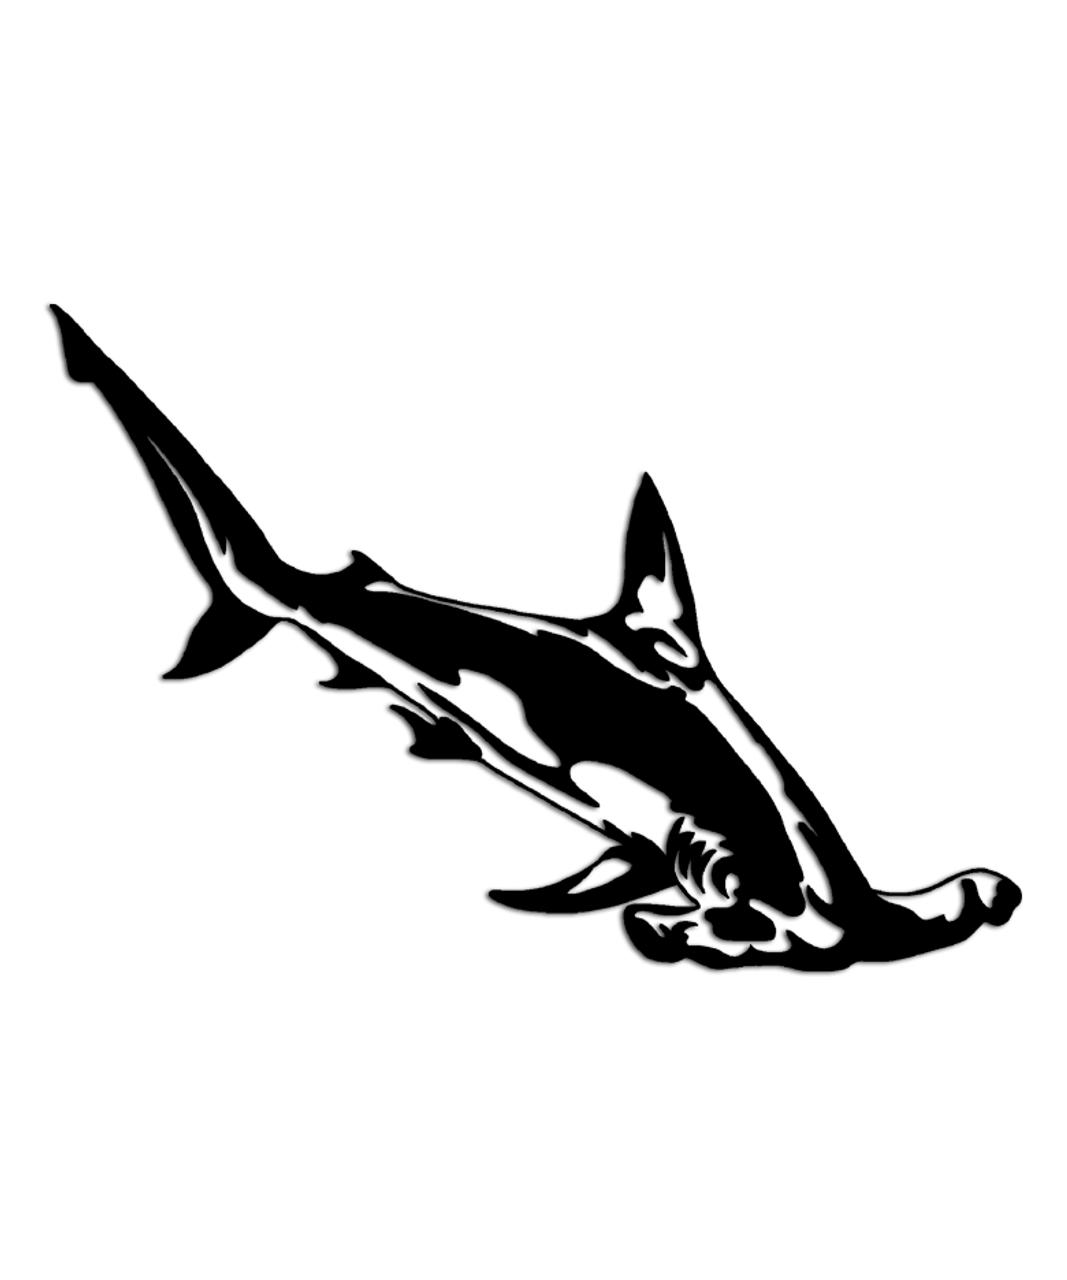 Well-liked Hammerhead Shark Sticker - Aftershock Decals BZ85